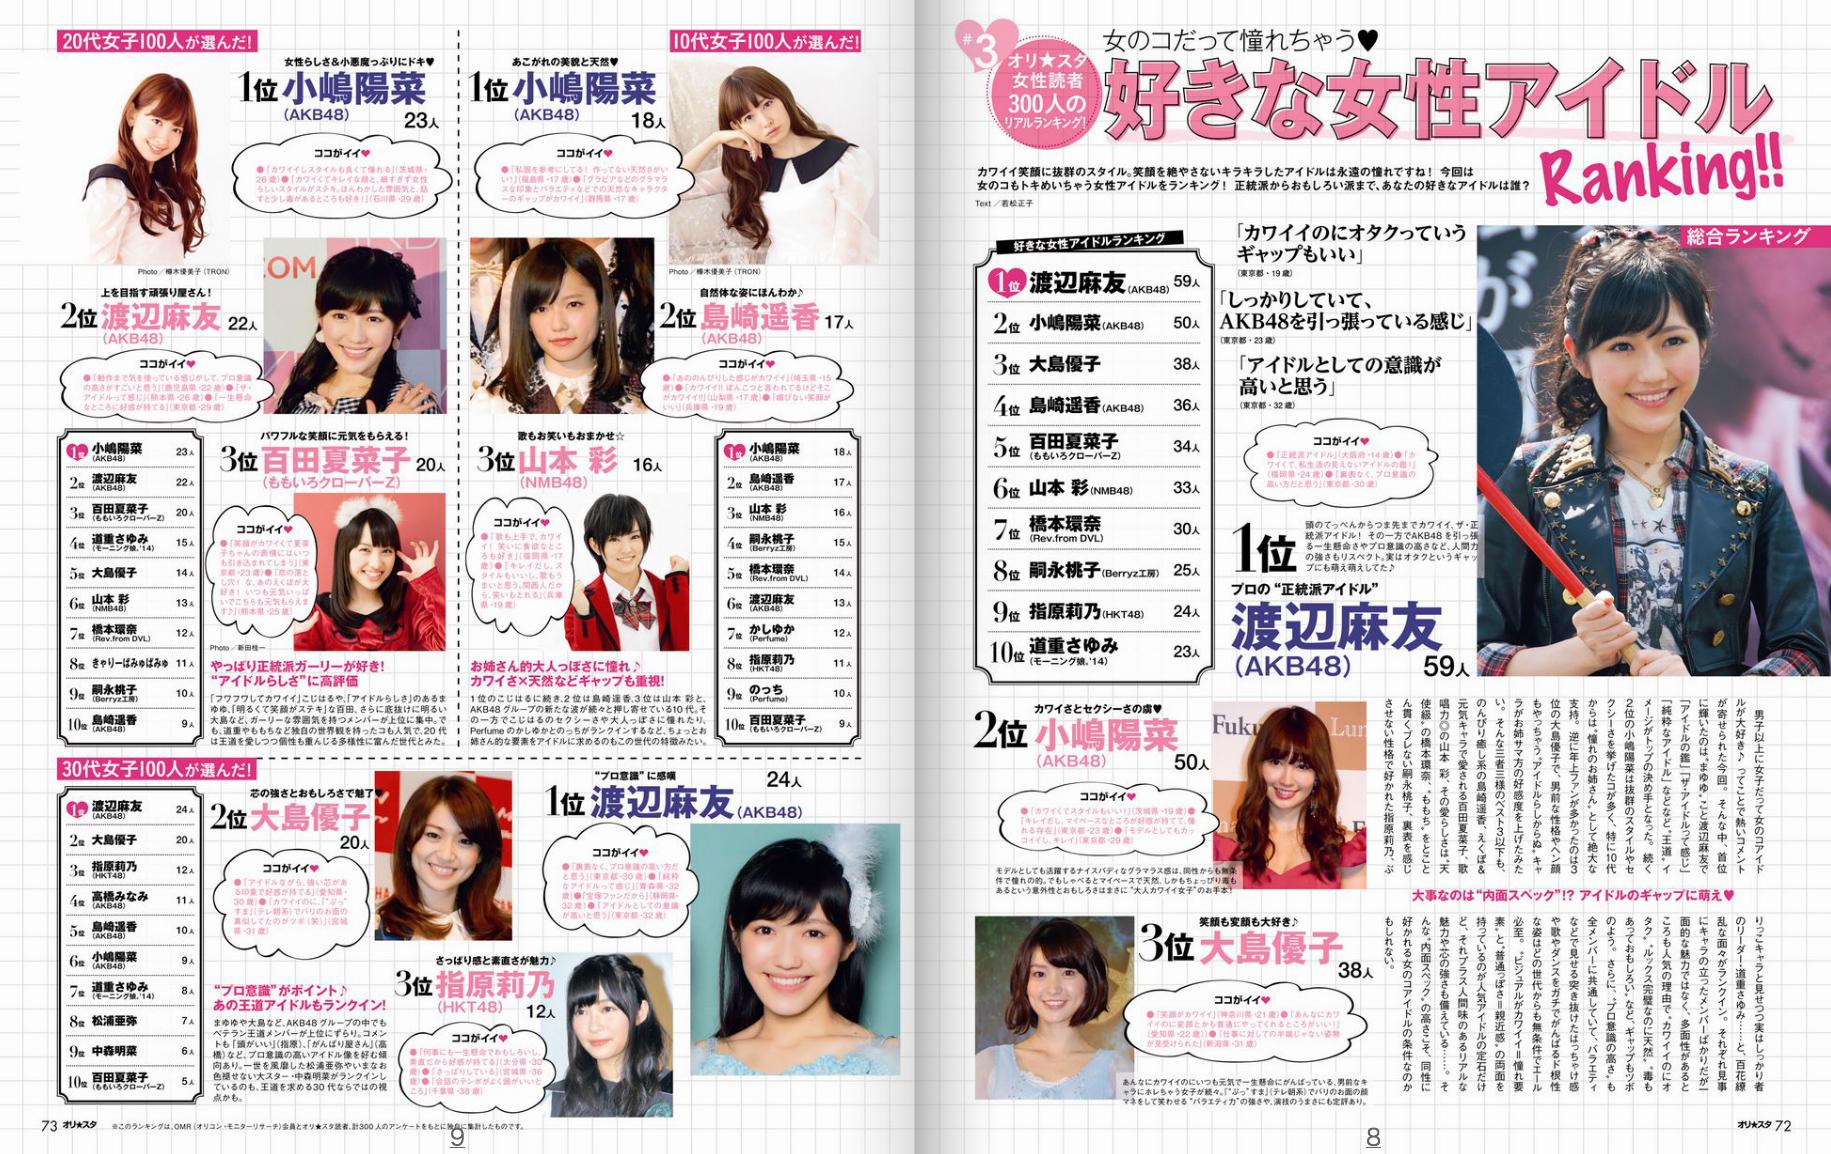 http://www.mayuwatanabe.net/wp/wp-content/uploads/2014/09/140913_orista_01.jpg